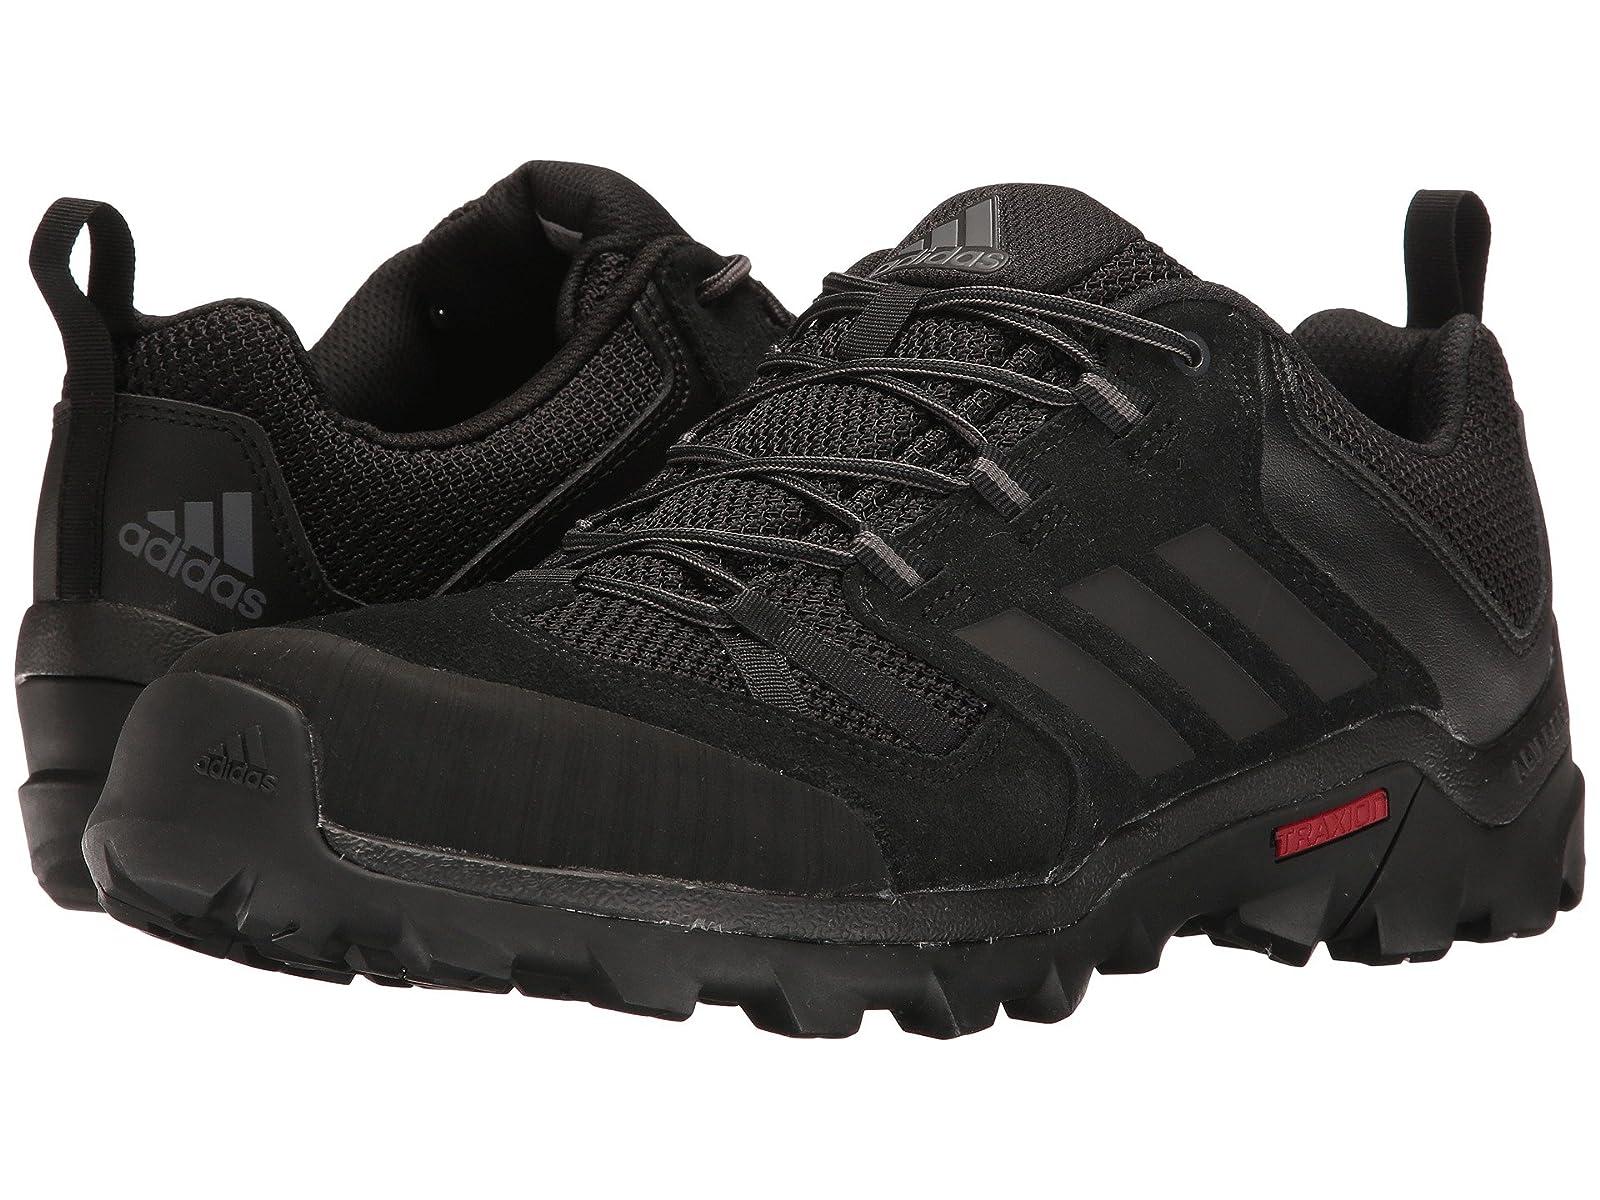 adidas Outdoor CaprockAtmospheric grades have affordable shoes